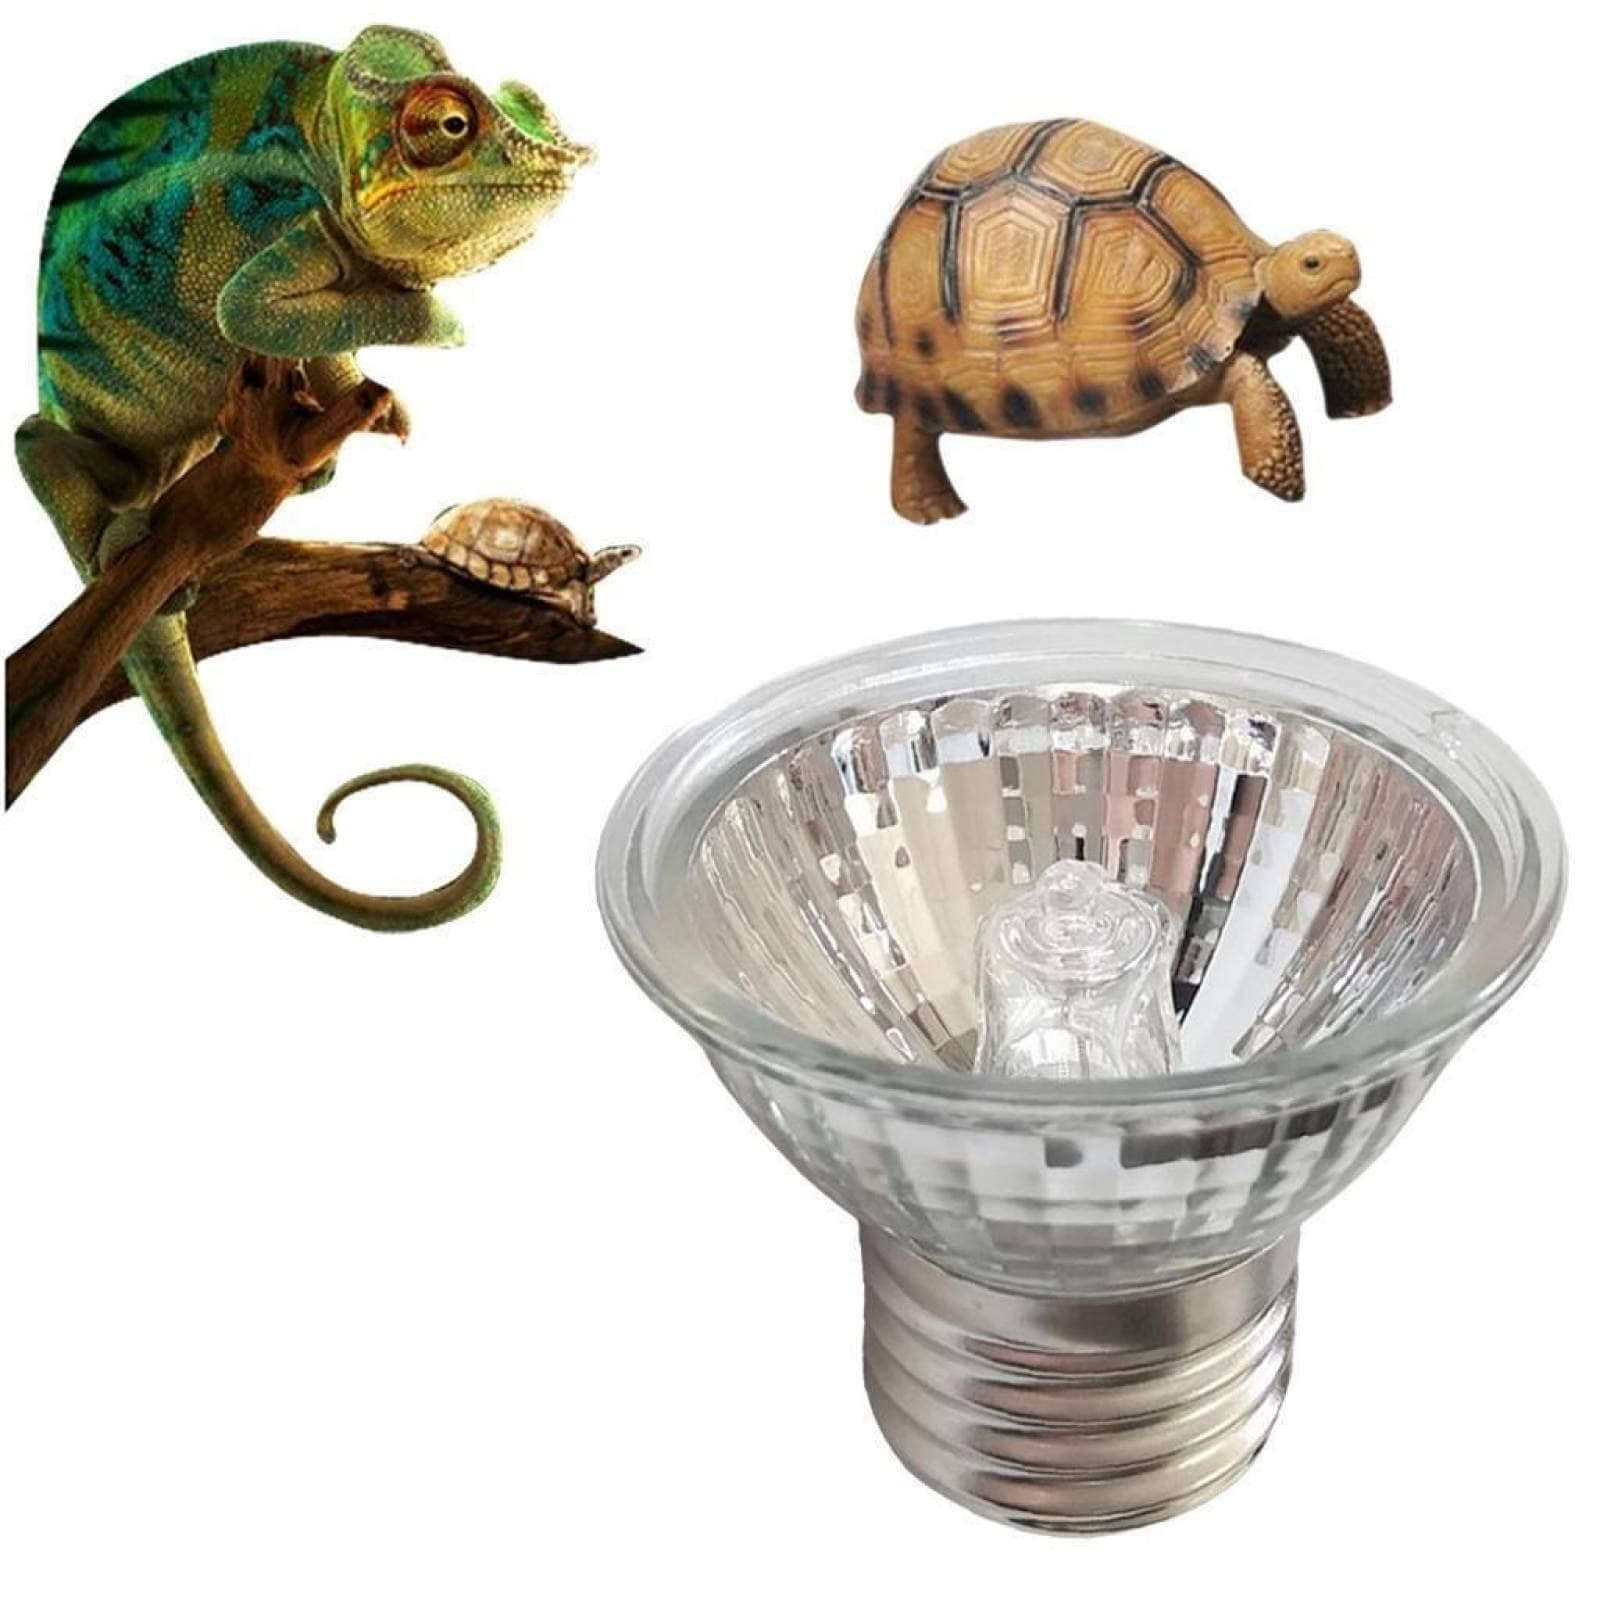 foco-emisor-calor-75w-exoterra-anfibio-reptiles-uva-uvb